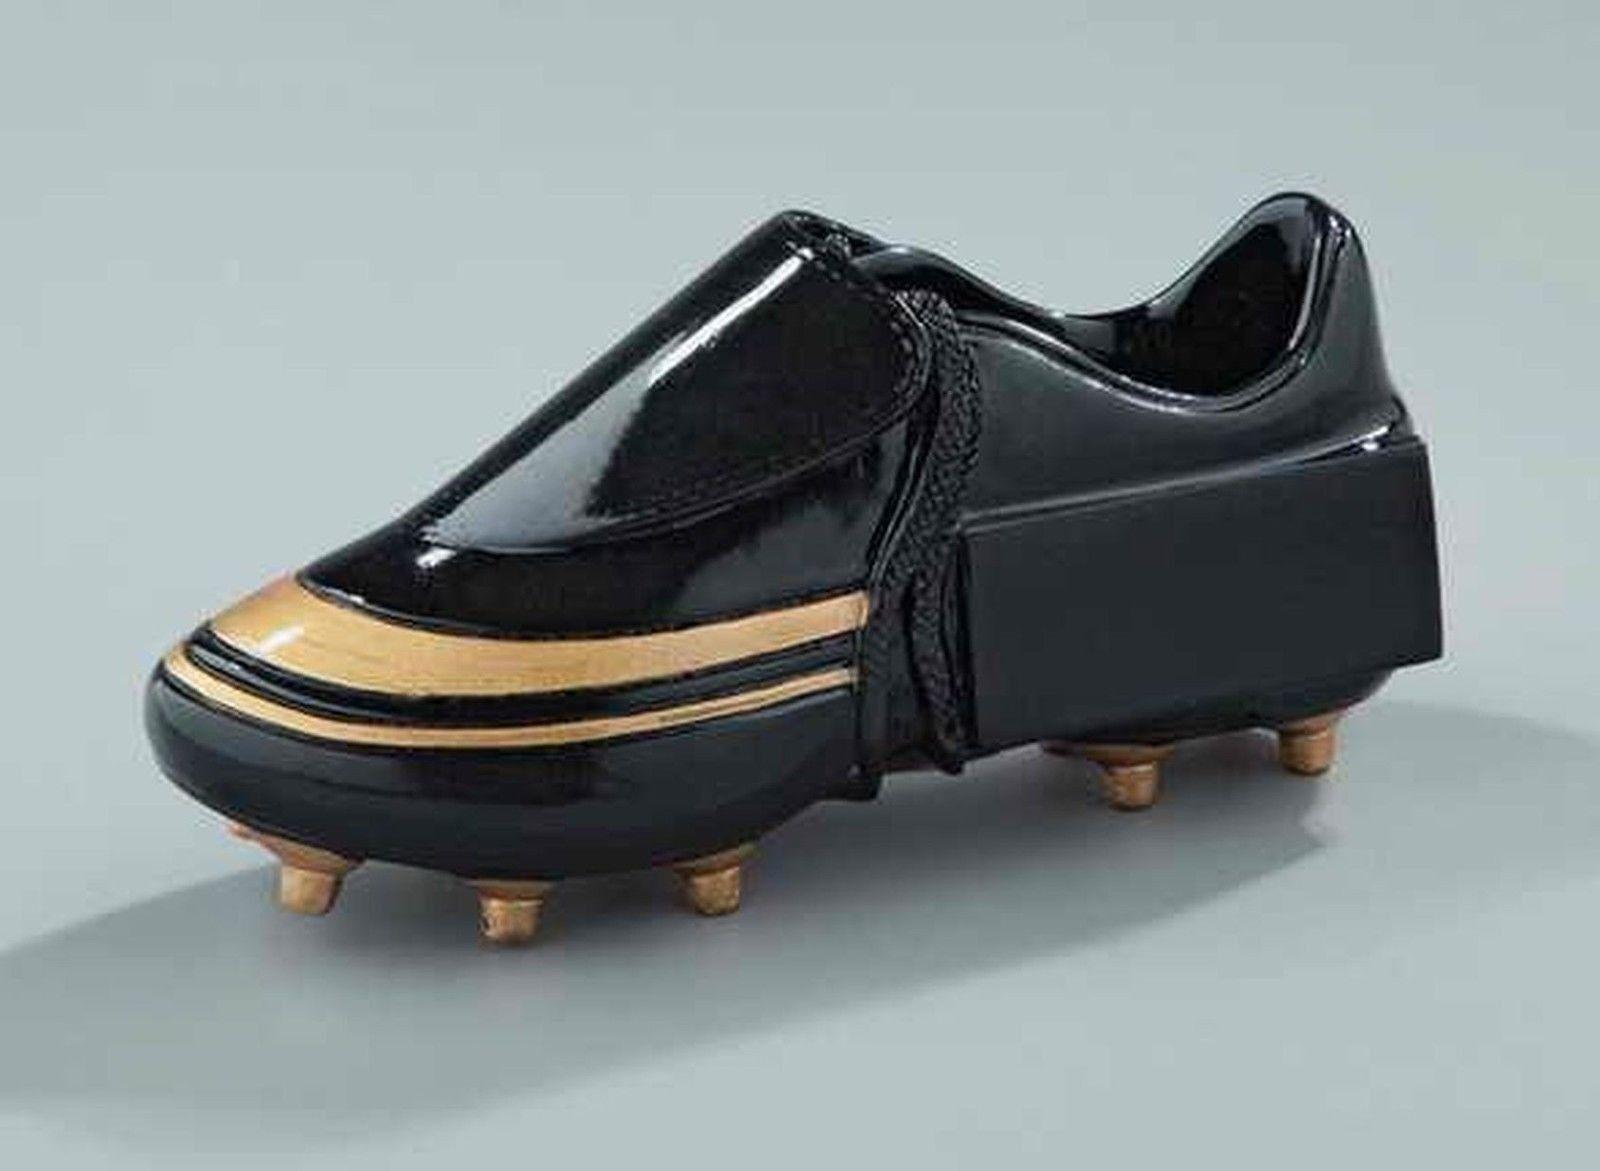 18 Figuren Fußball Fußball Schuh 130x55mm    187f (Pokal Pokale Gravur Turnier) e4ac3d